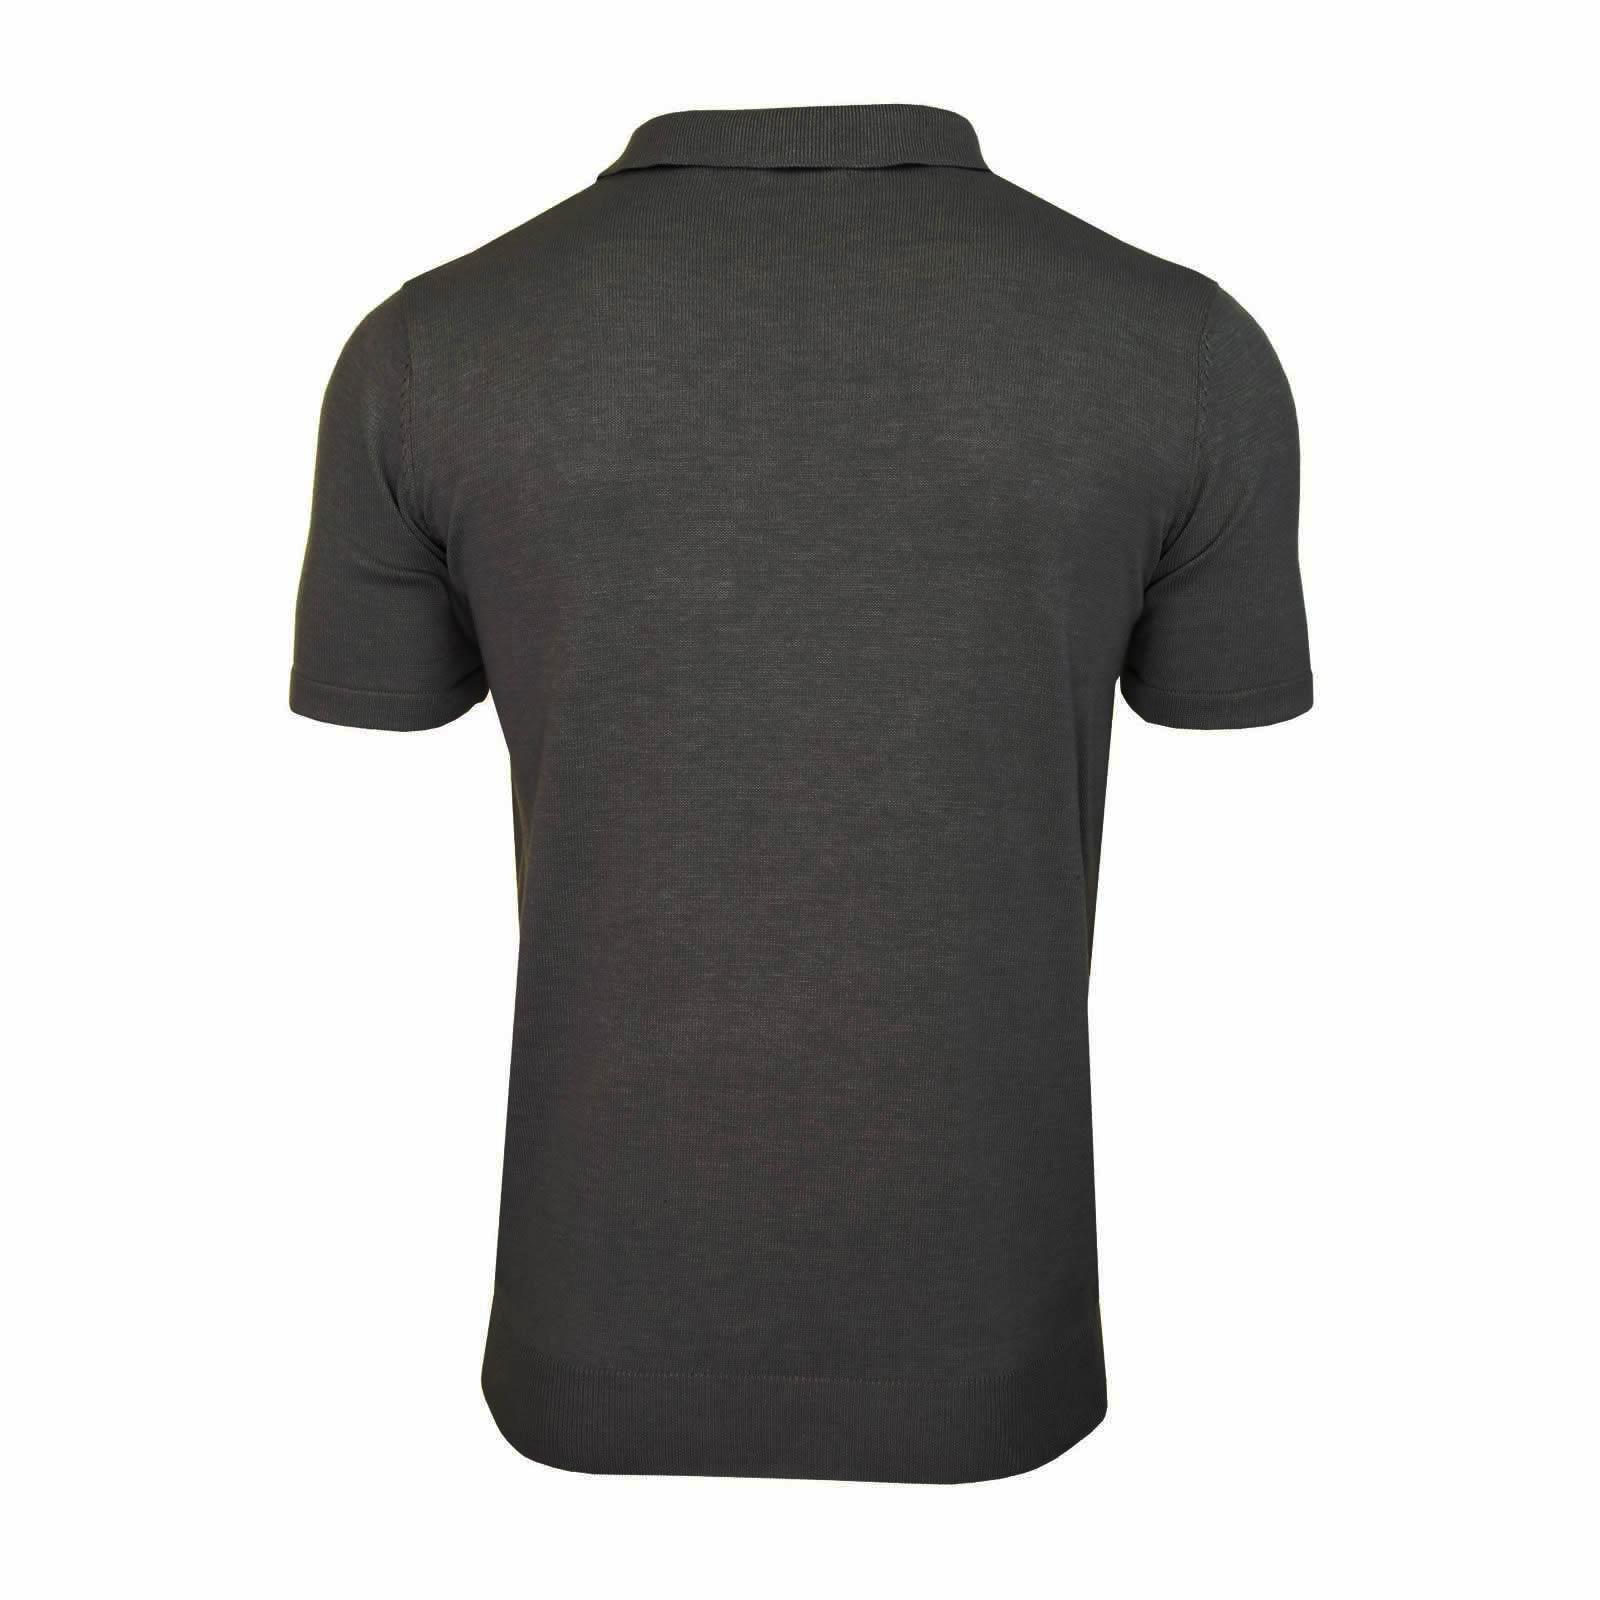 Mens-Knitted-Polo-Brave-Soul-Columbus-Collared-Short-Sleeve-Jumper-T-Shirt thumbnail 21